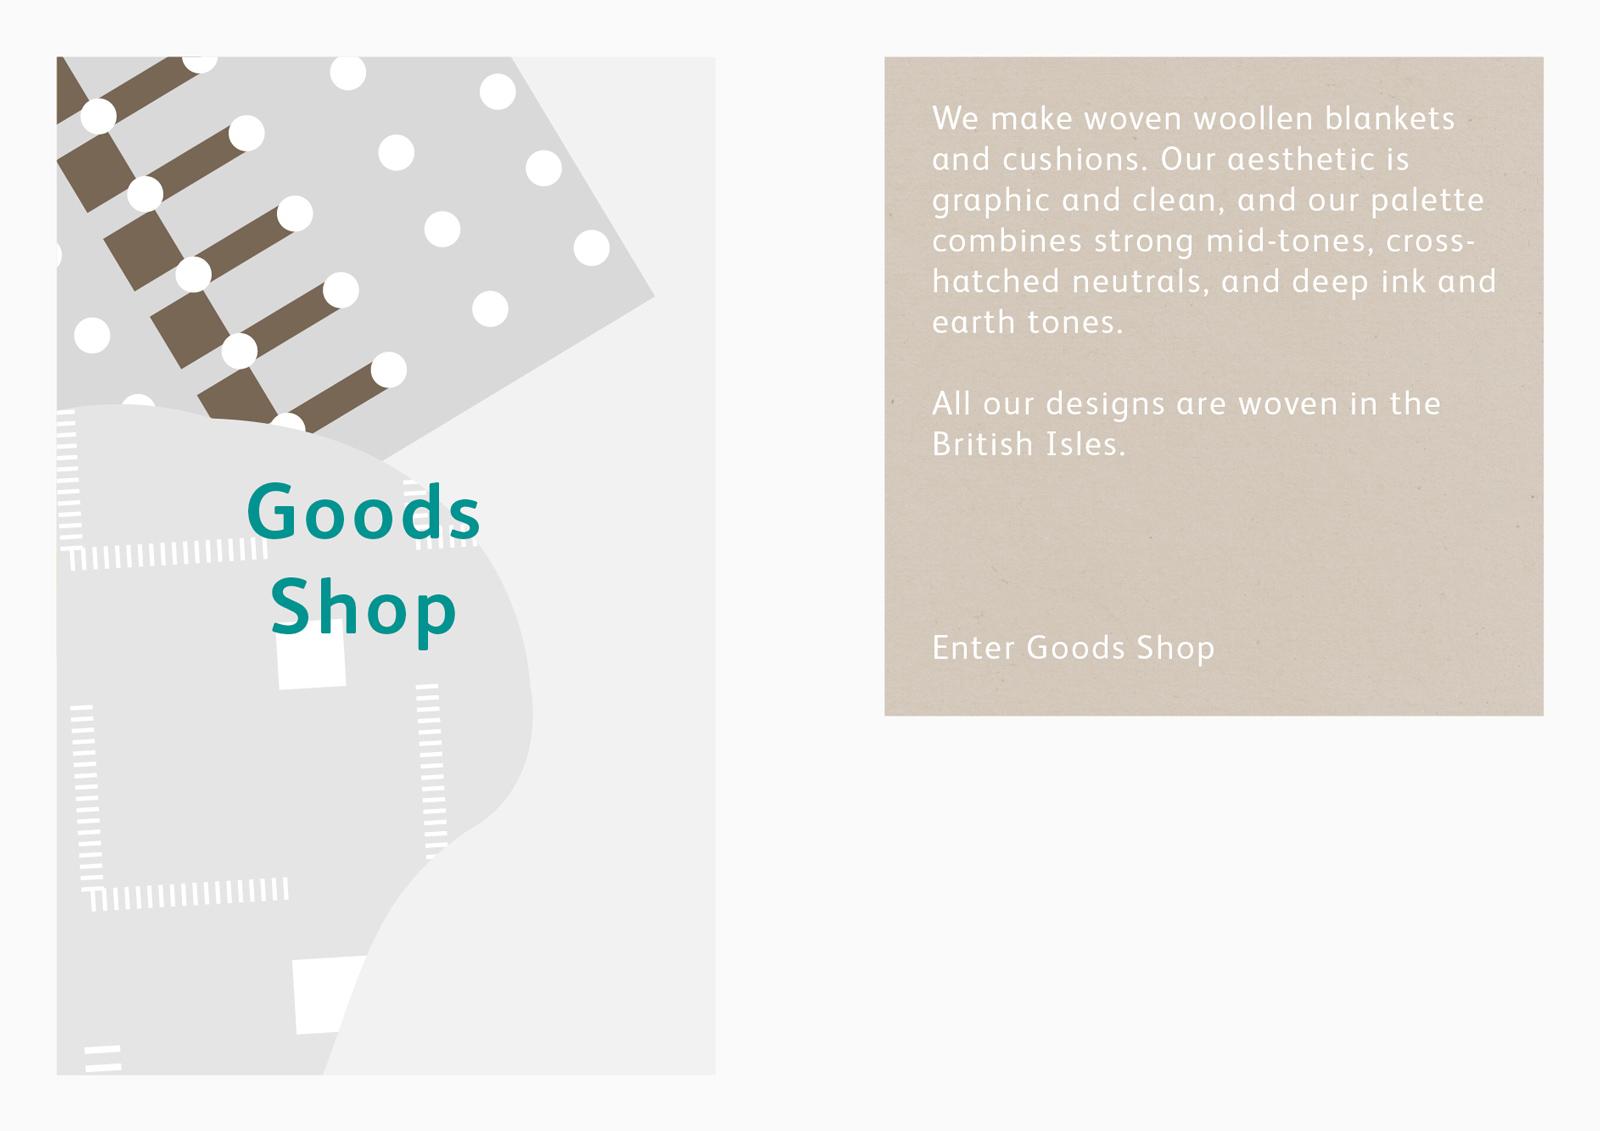 Goods Shop